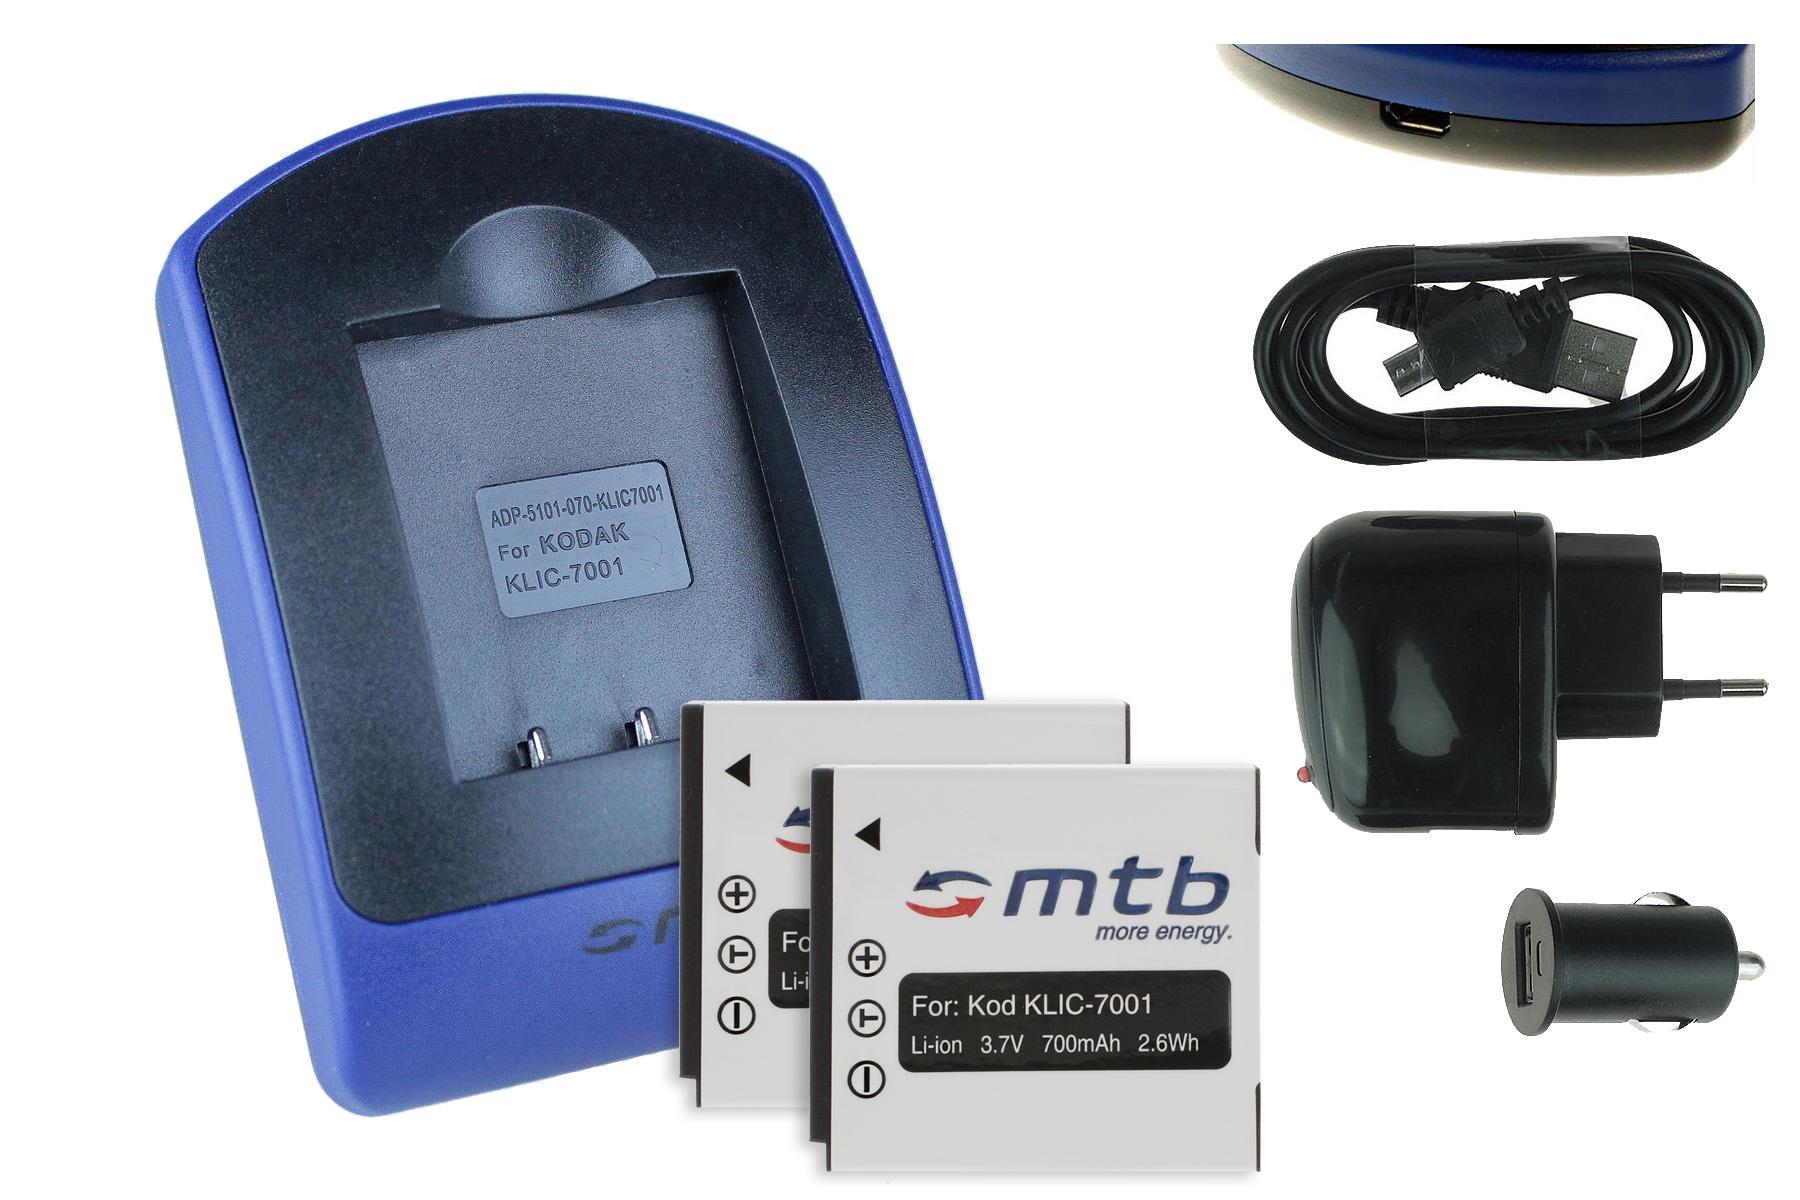 2x batterie usb caricatore per silvercrest sca a1 for Caricabatterie lidl